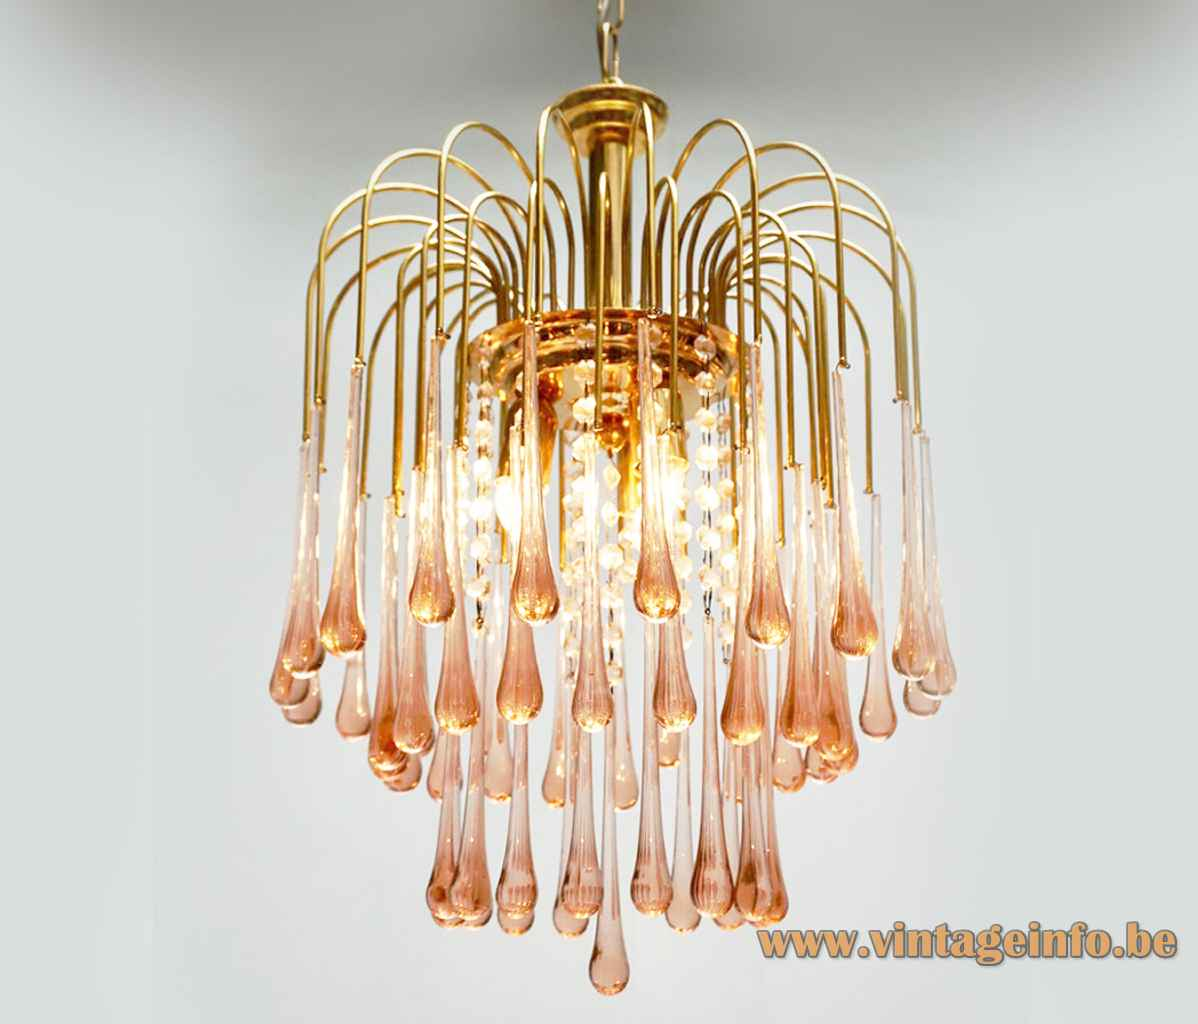 Pink glass teardrops chandelier gold coloured metal brass frame no Venini Murano 1980s 1990s Massive Belgium